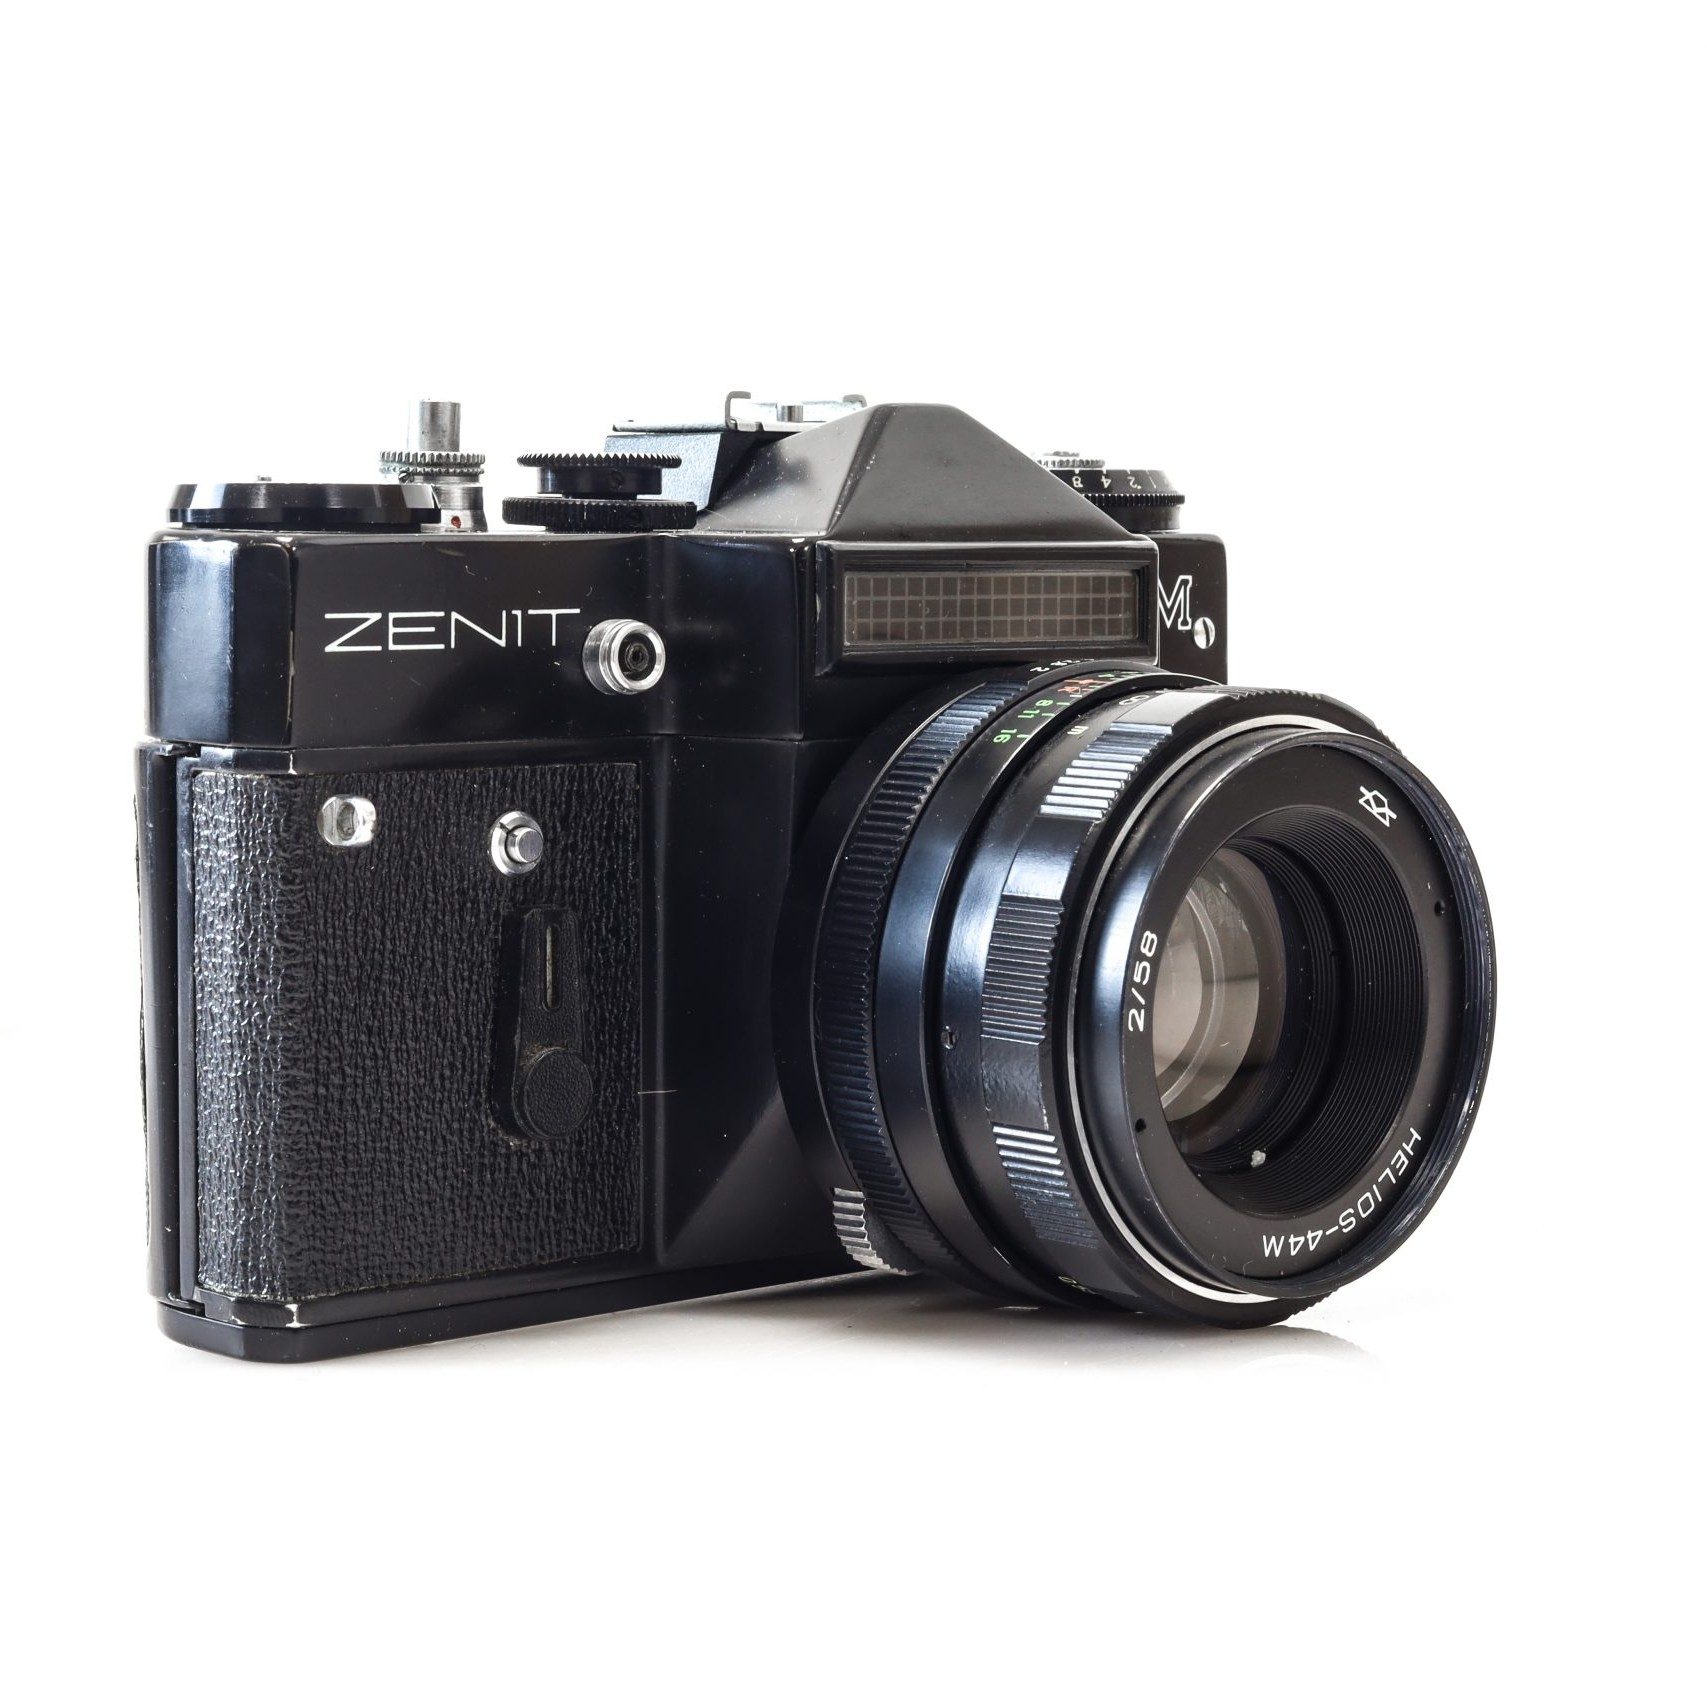 Beautiful Zenit EM 35mm Soviet Film Camera with Helios 44m Lens